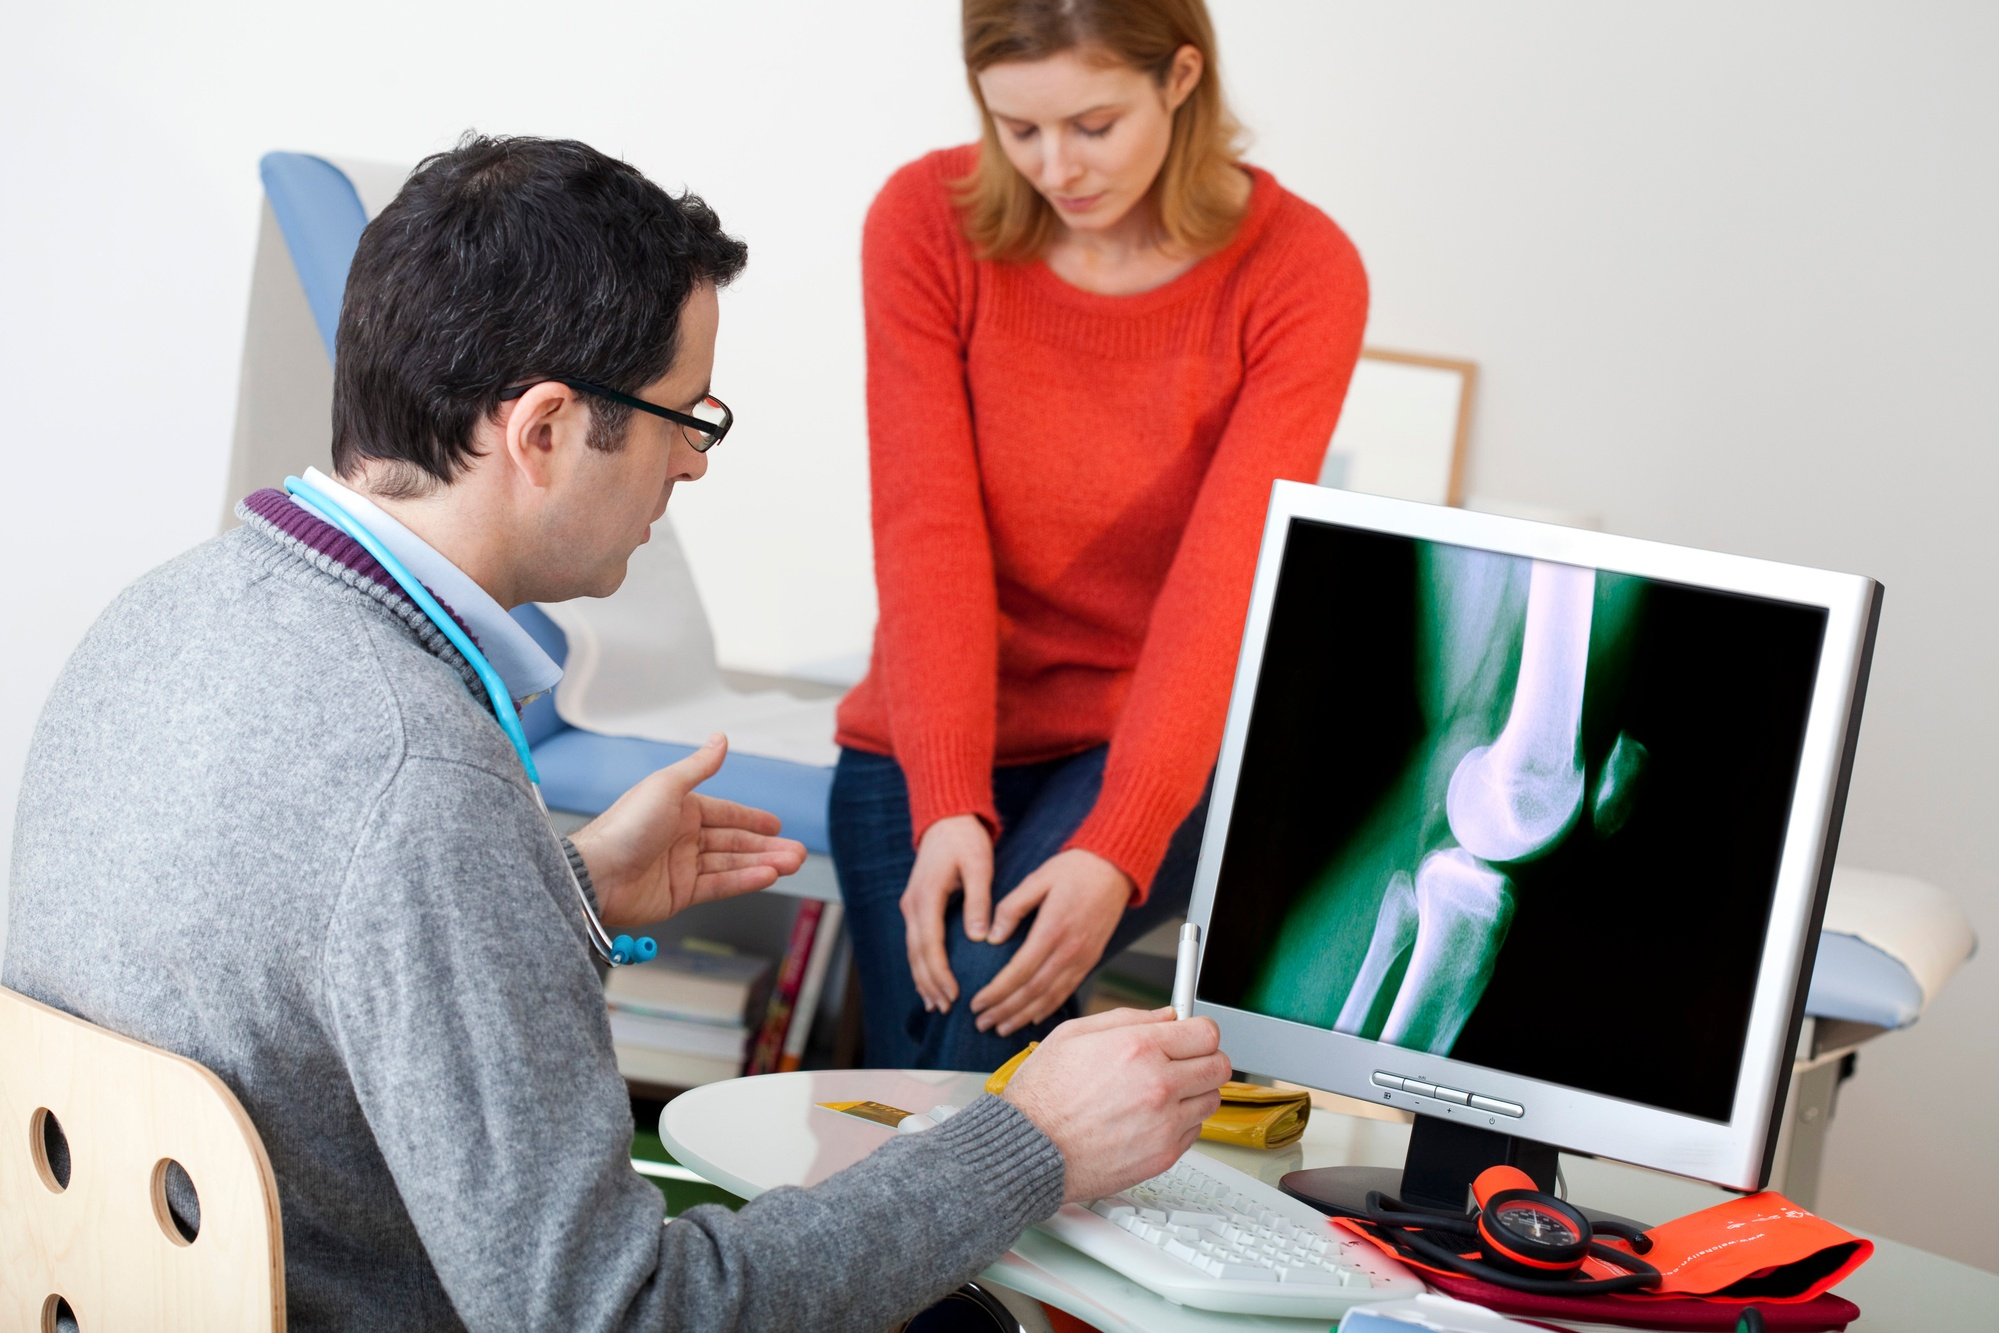 consultation bow leg correction surgery blog woman in office orthopedics.jpg